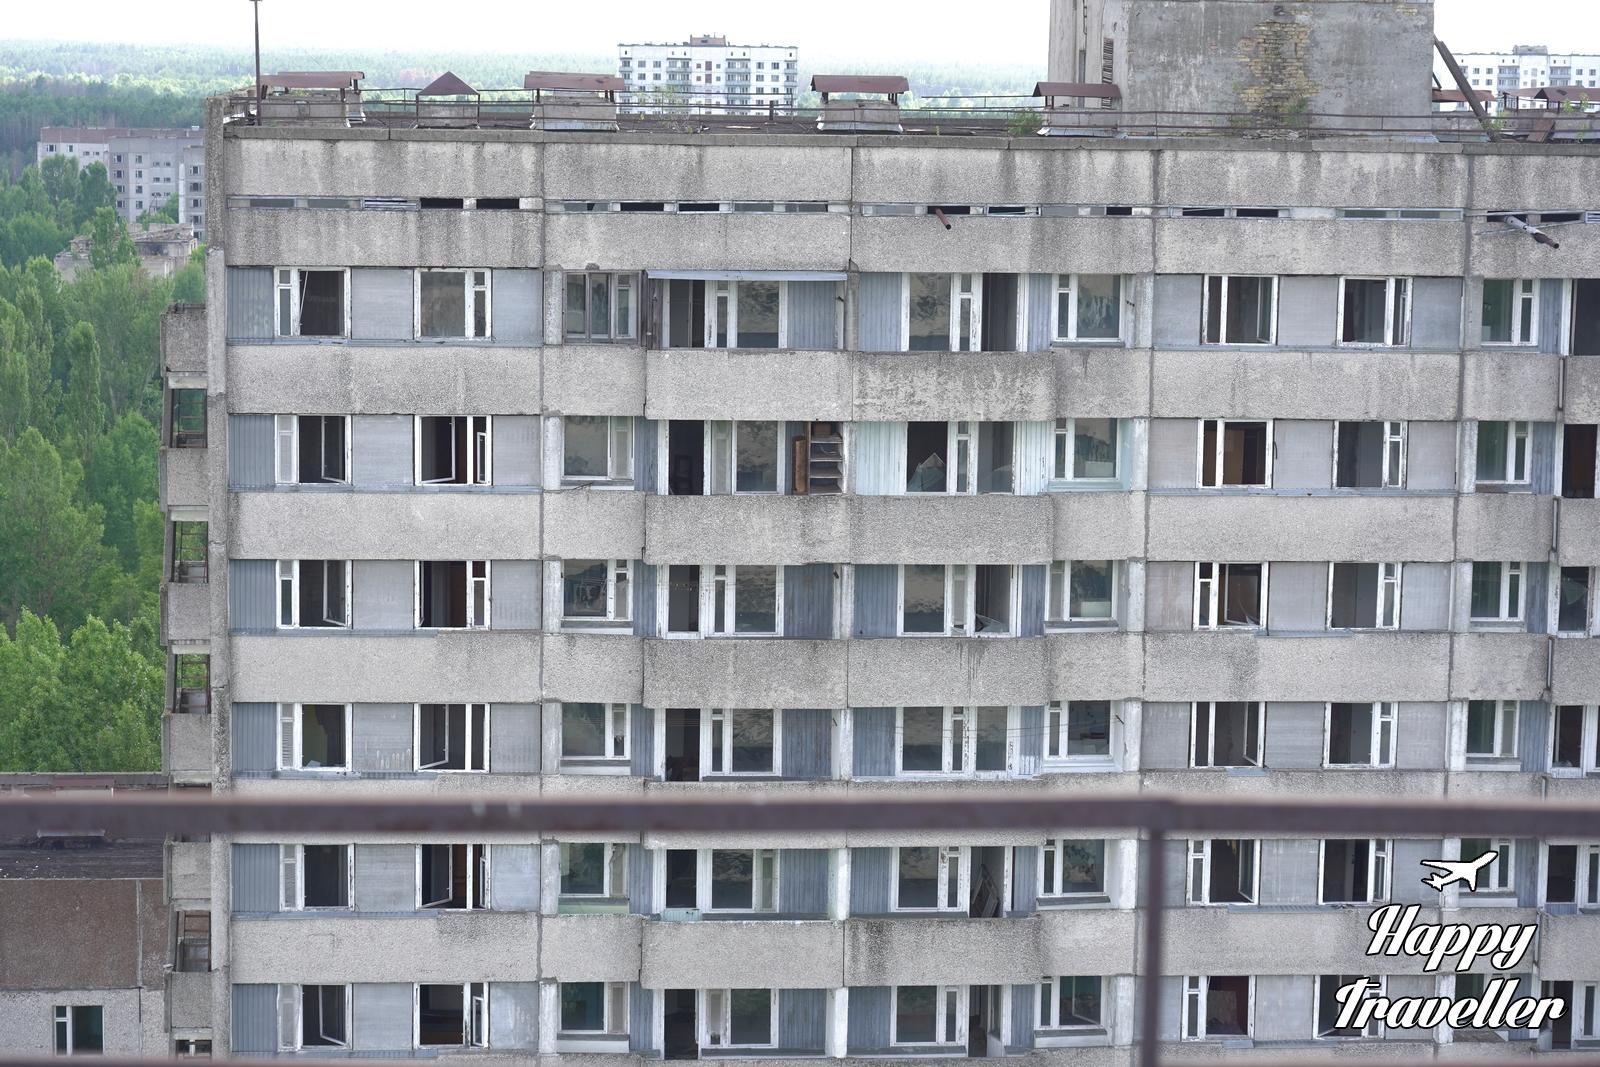 chernobyl ukraine happy traveller (16)